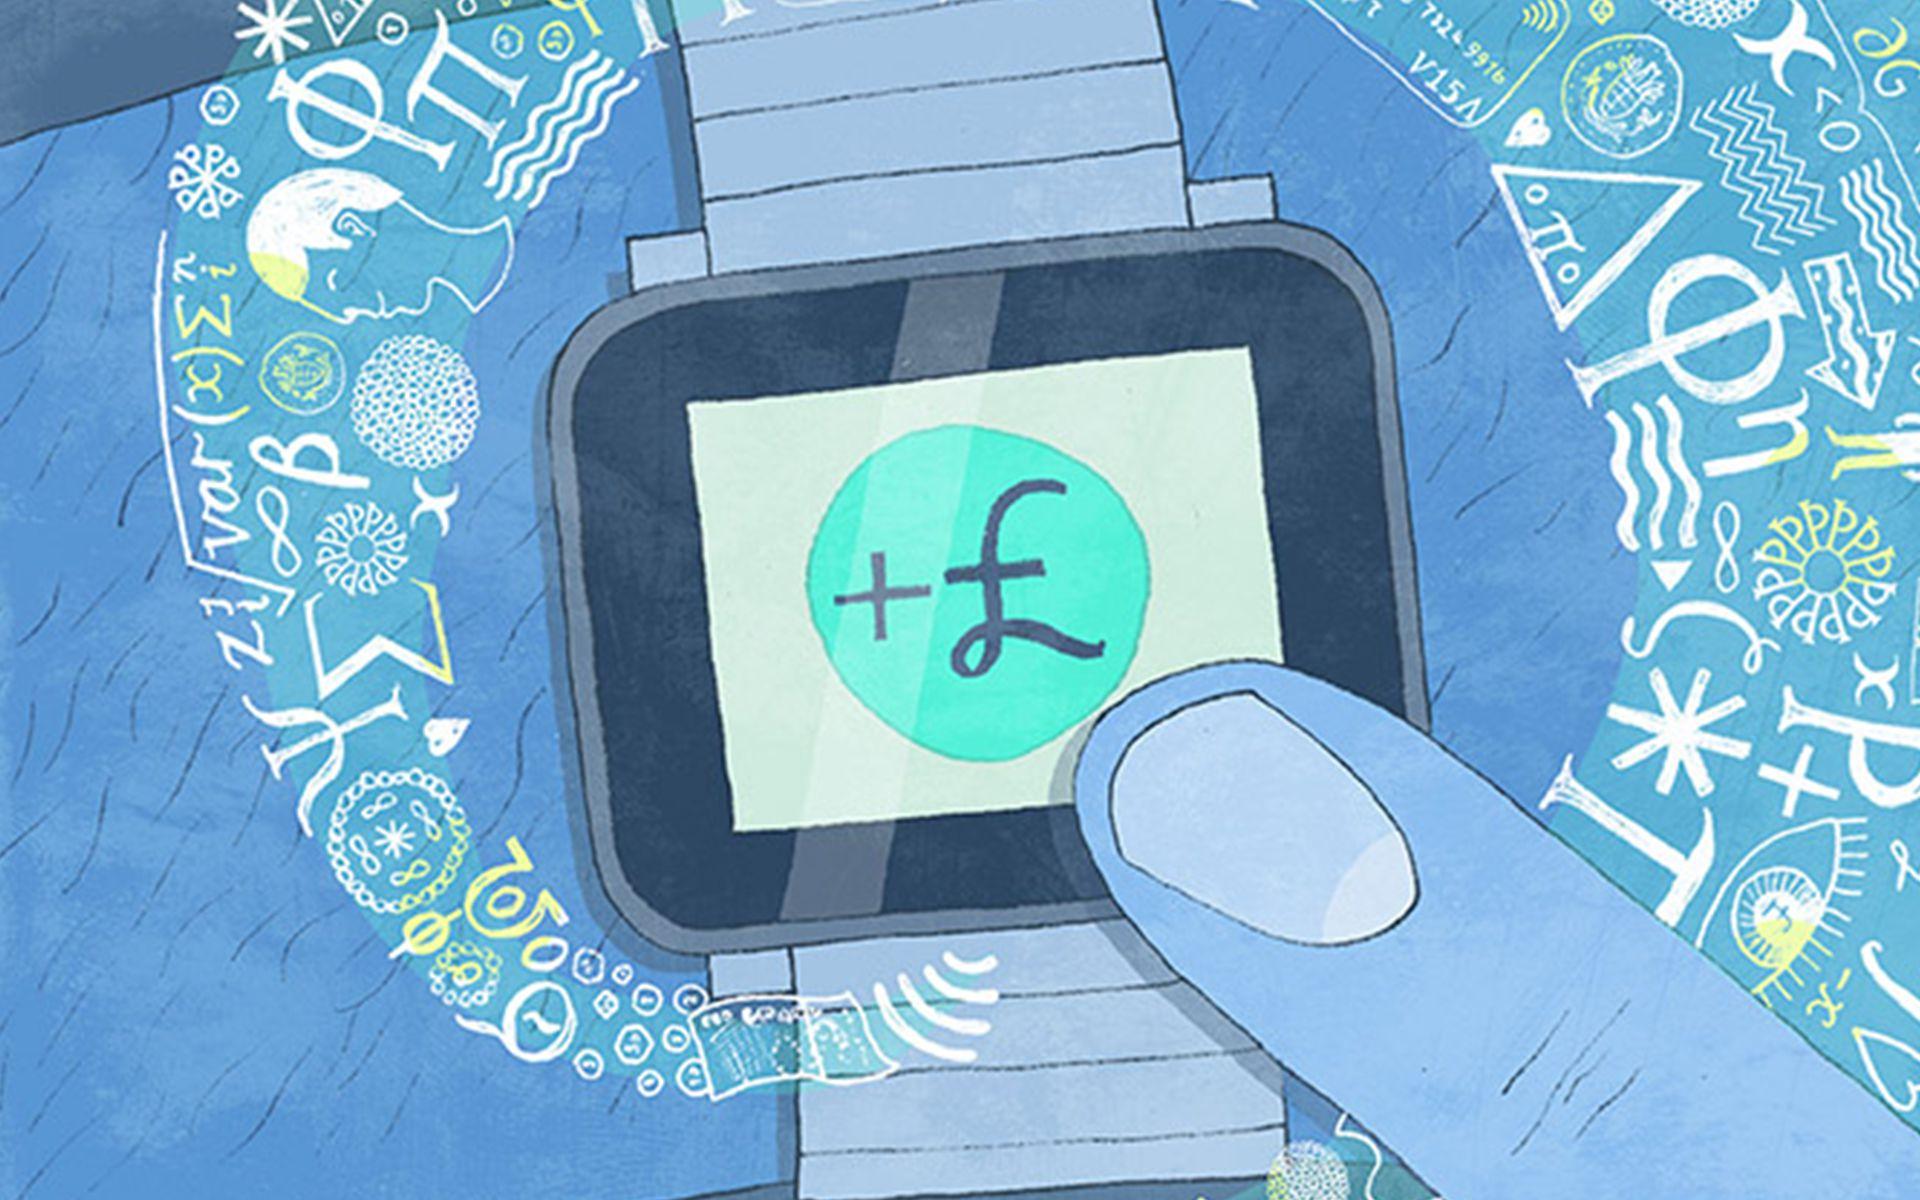 Smart watch illustration